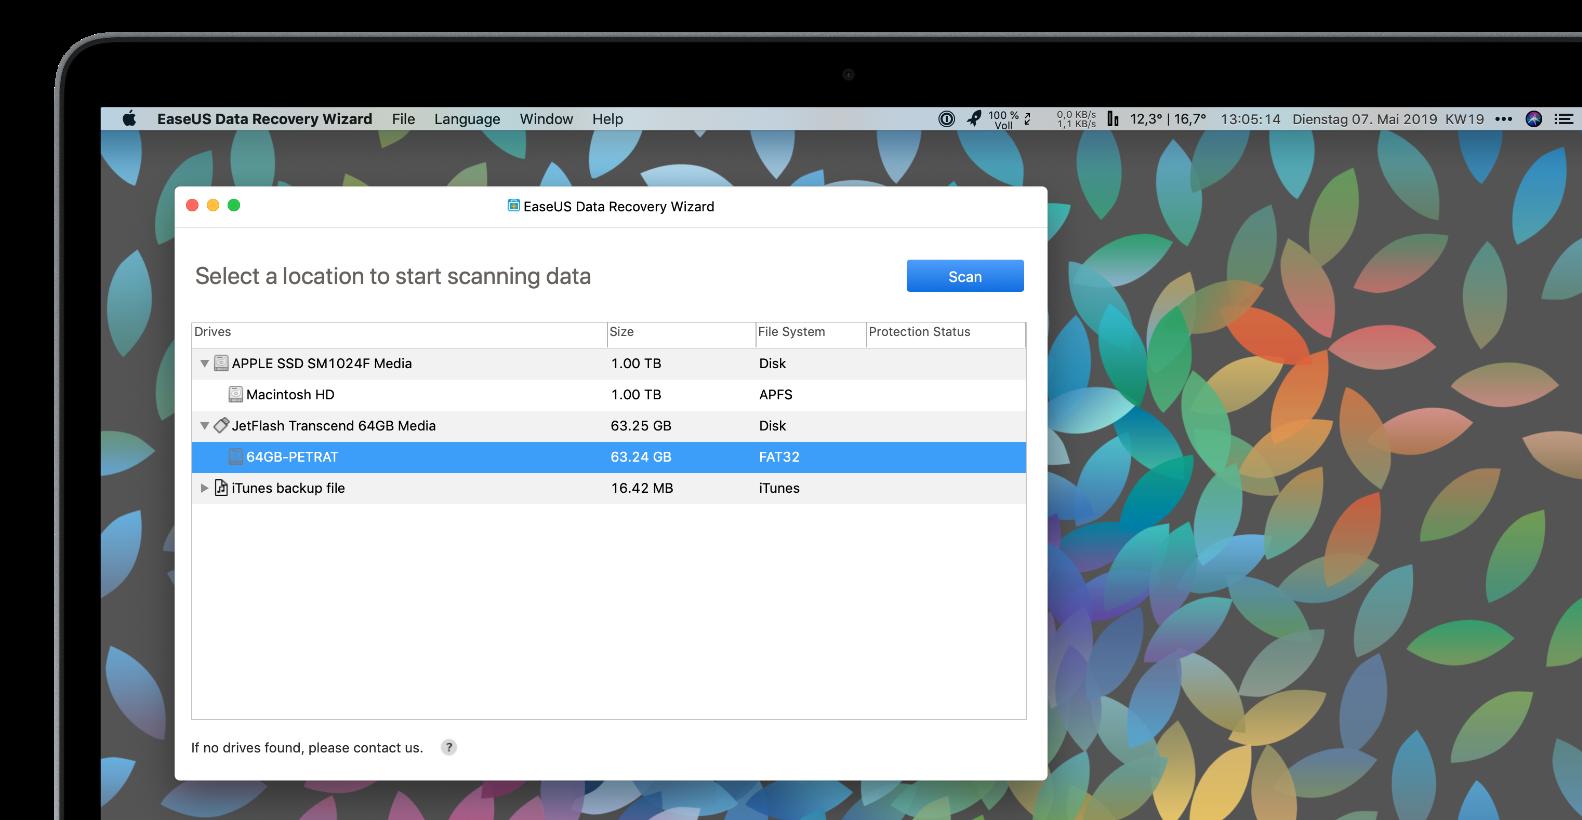 EaseUS_Data_Recovery_Wizard_Mac_Windows_Review_Software5 Data Recovery Wizard für Mac und Windows von EaseUS - gelöschte Daten wiederherstellen